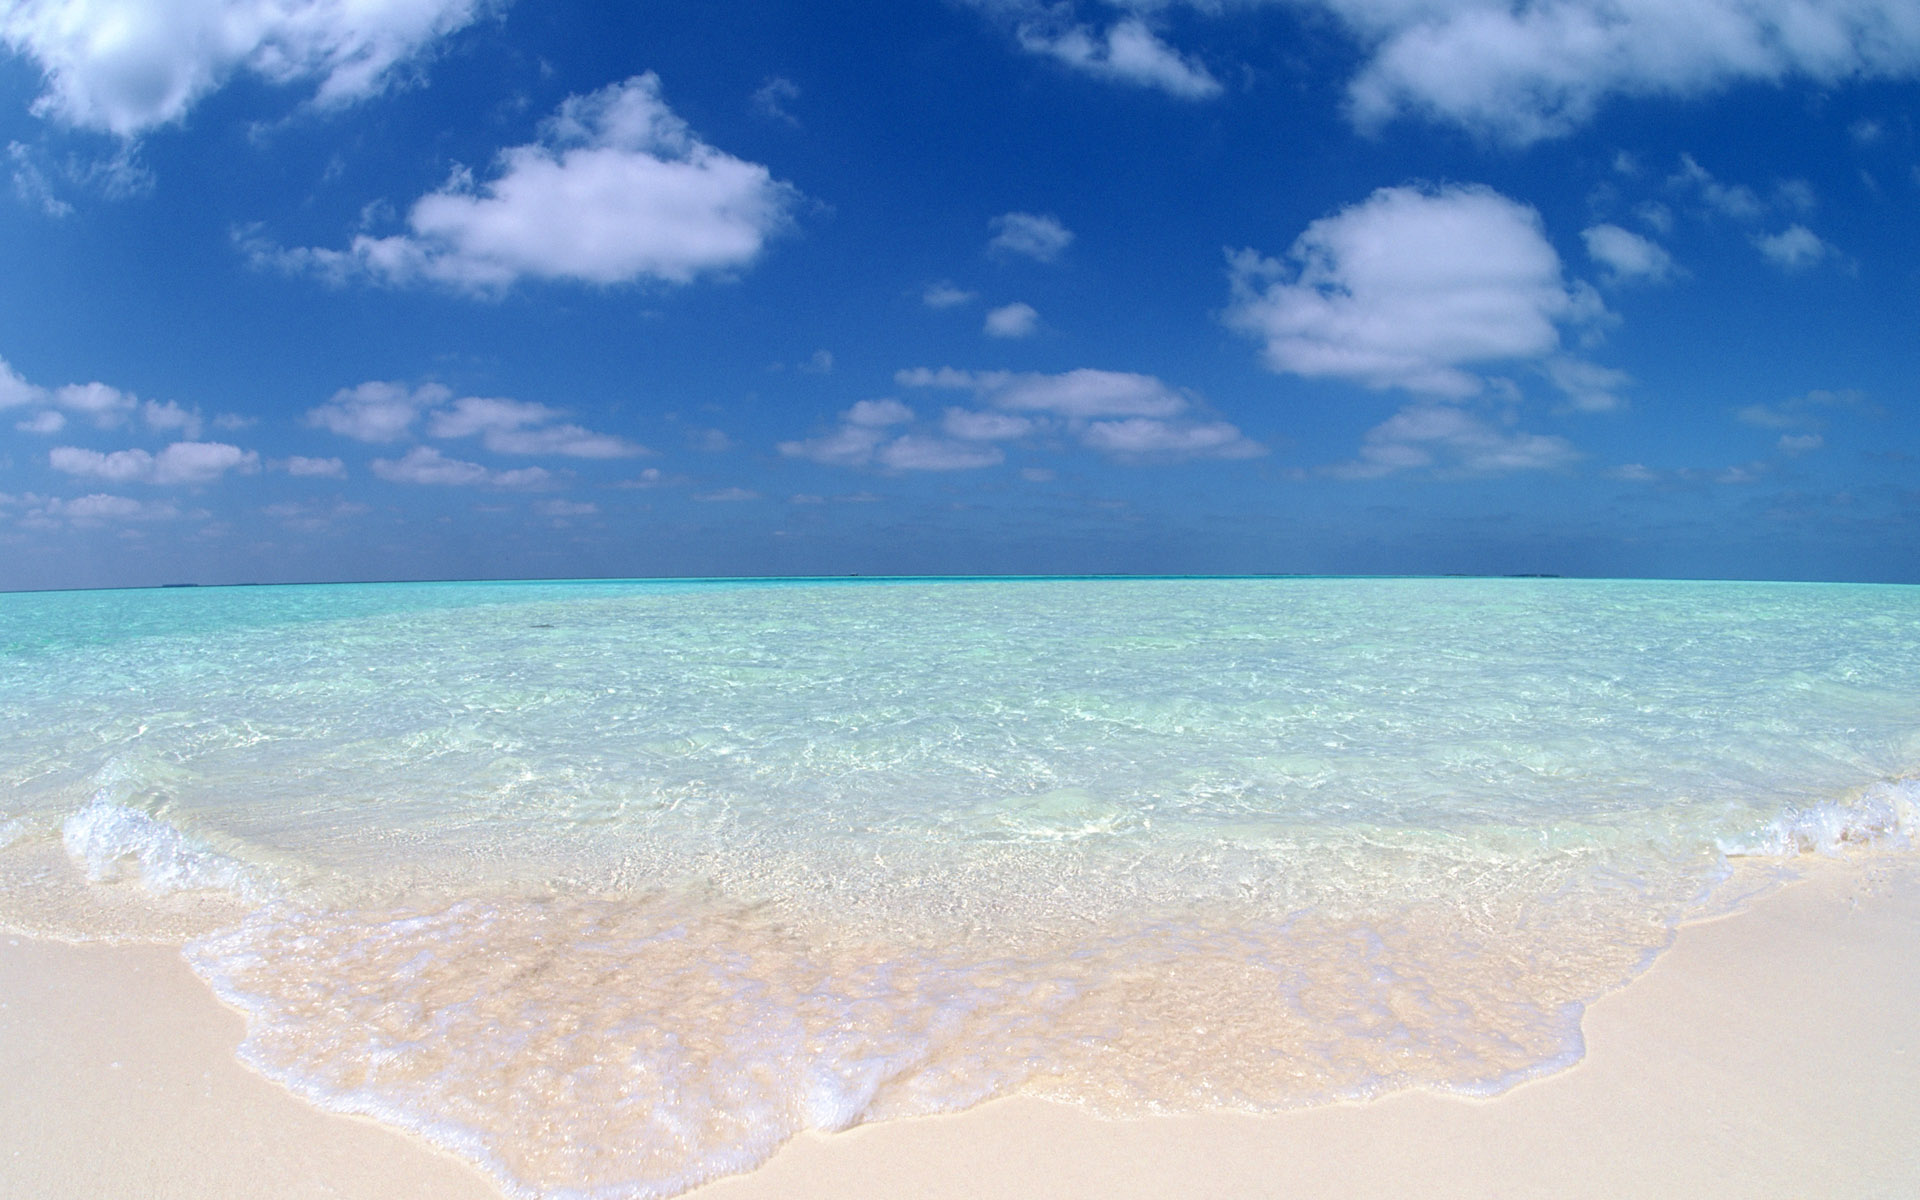 Beach Background Wallpaper - WallpaperSafari